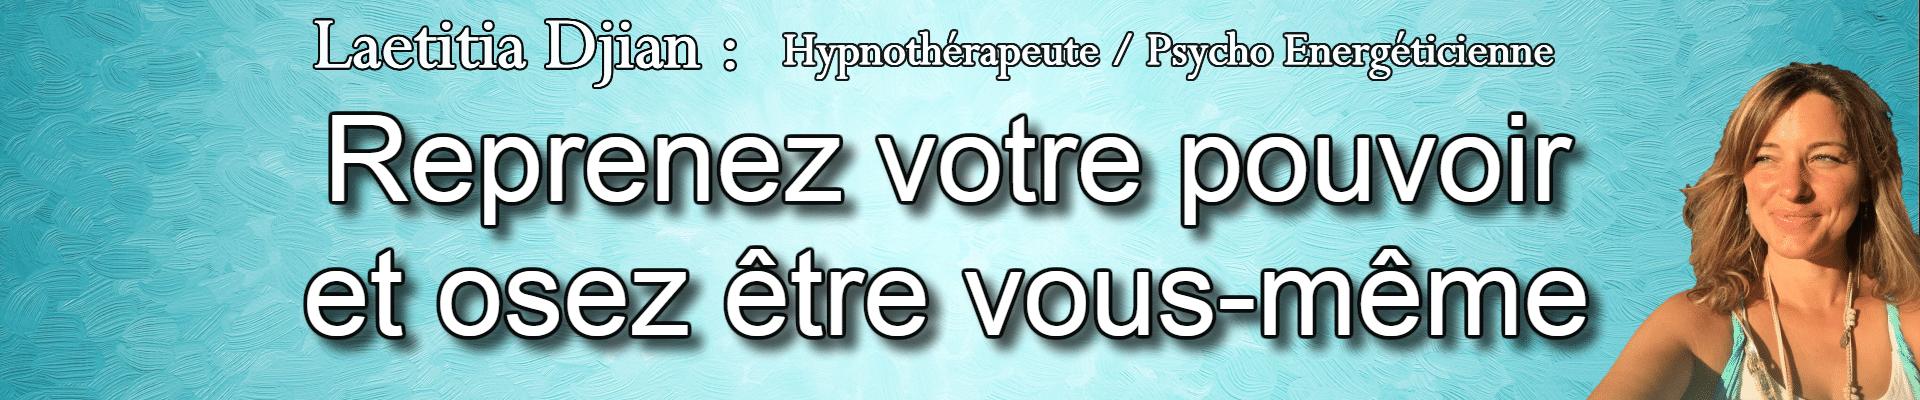 bannière Laetitia Djian avec phrase